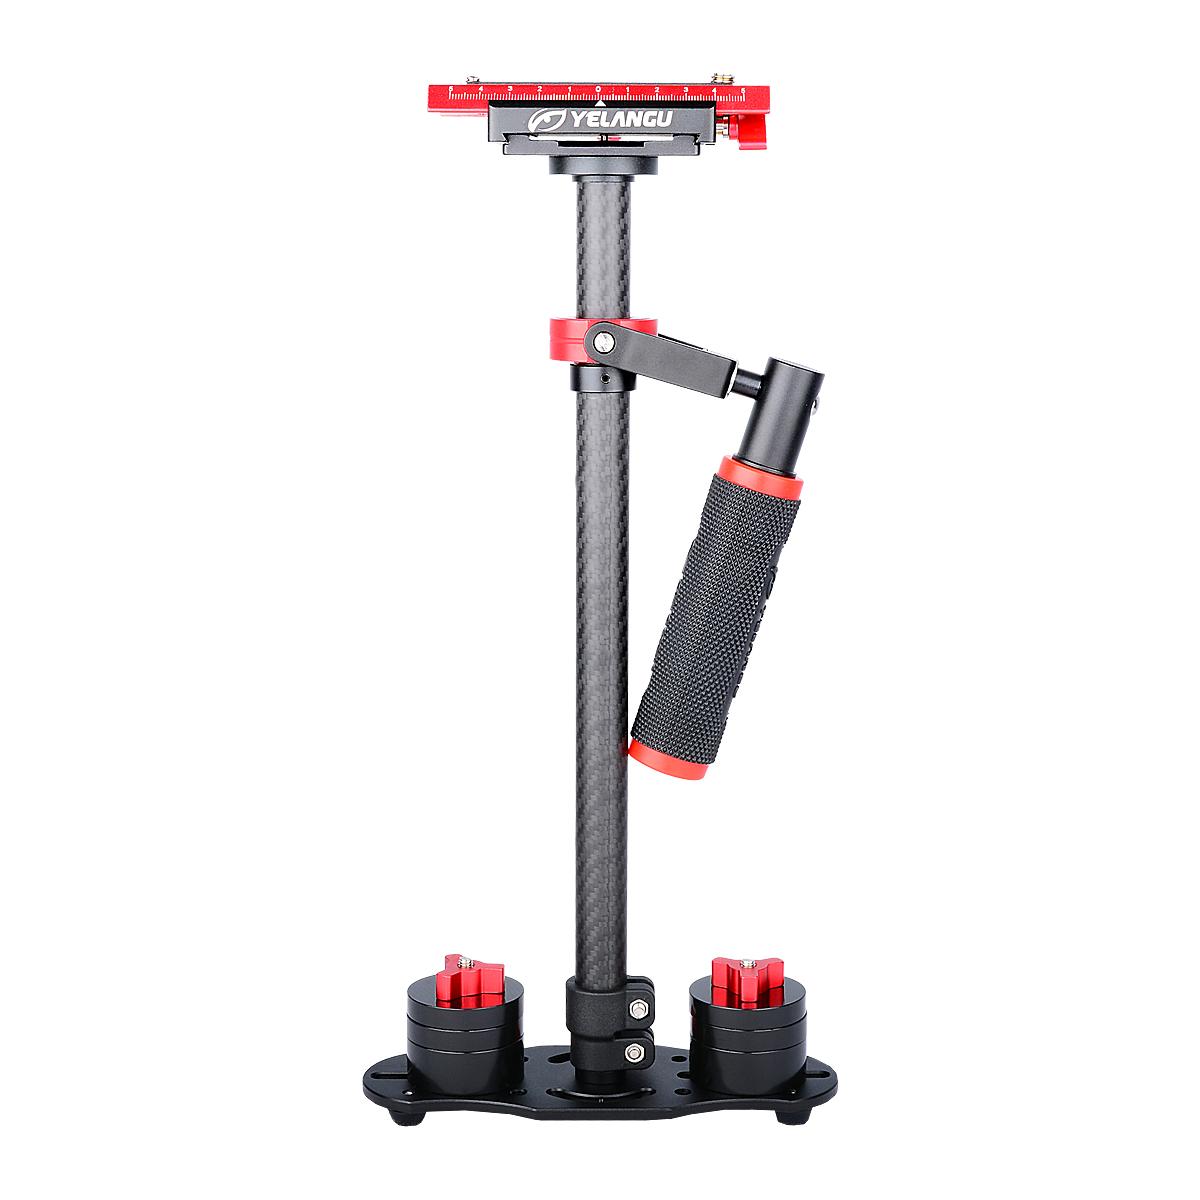 YELANGU Rubber Handle Aluminum ABS Stabilizer Steadycam For Mini DV Camera